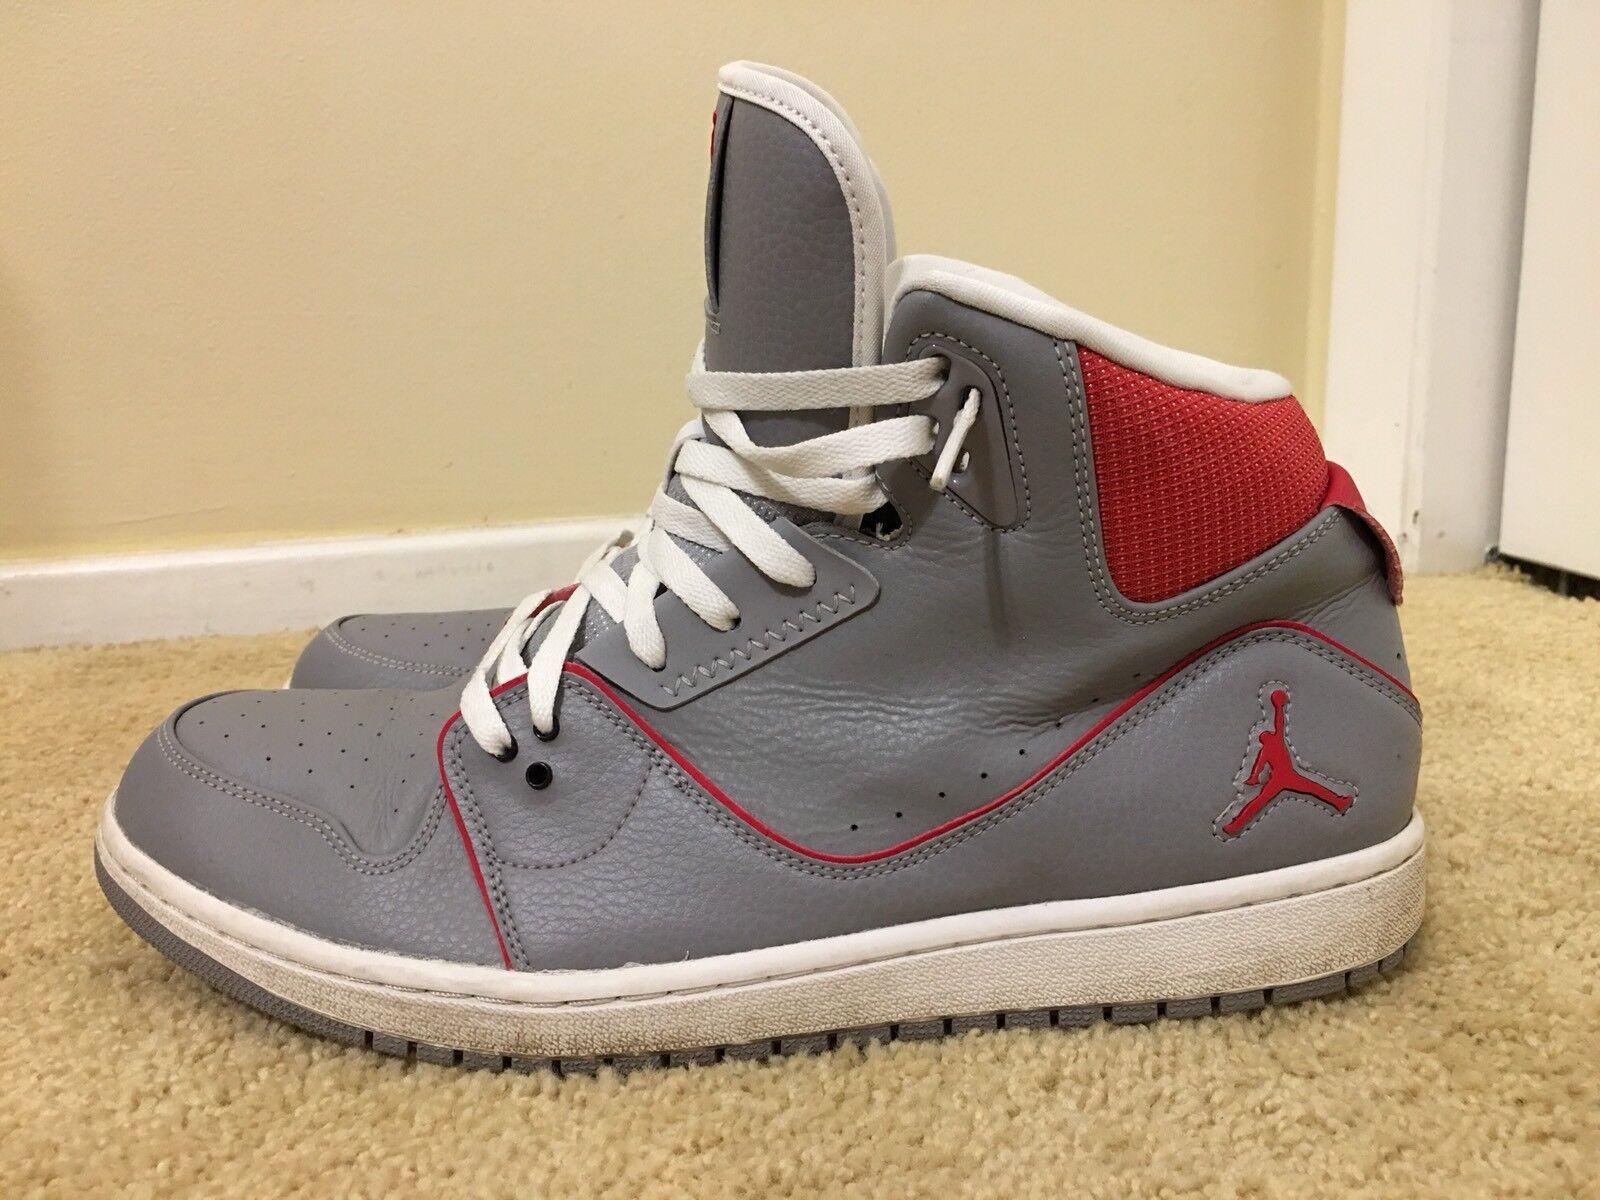 Nike 555798-019, Air Jordan 1 Flight, 555798-019, Nike gris / rojo, Hombre Basketball Shoes, comodo precio de temporada corta, beneficios de descuentos 39ba18